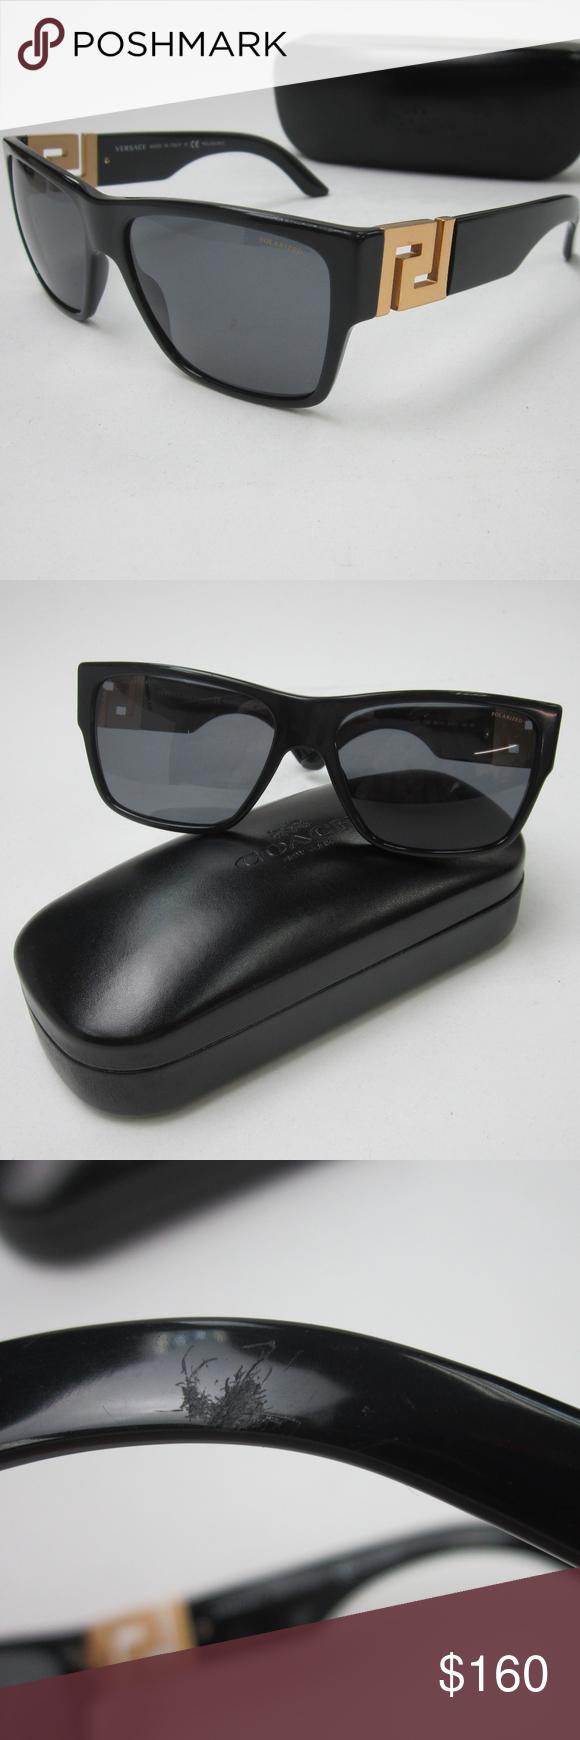 5e7434be5c Versace 4296 GB1 81 PlZ Sunglasses  Italy OLI439 Versace MOD. 4296 ...